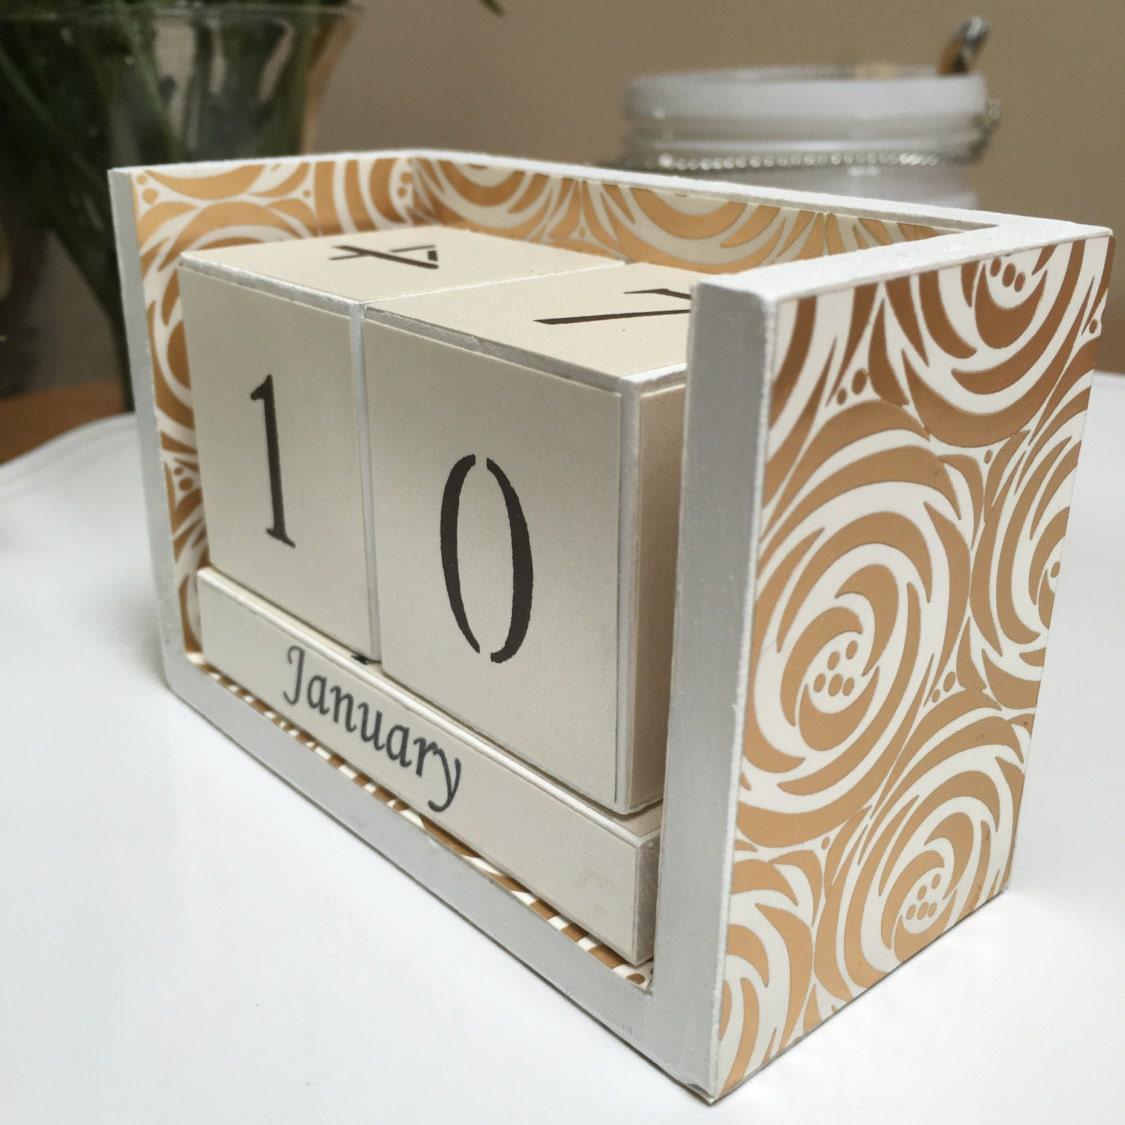 Calendar Wooden Blocks : Perpetual desk calendar wooden blocks hand painted white